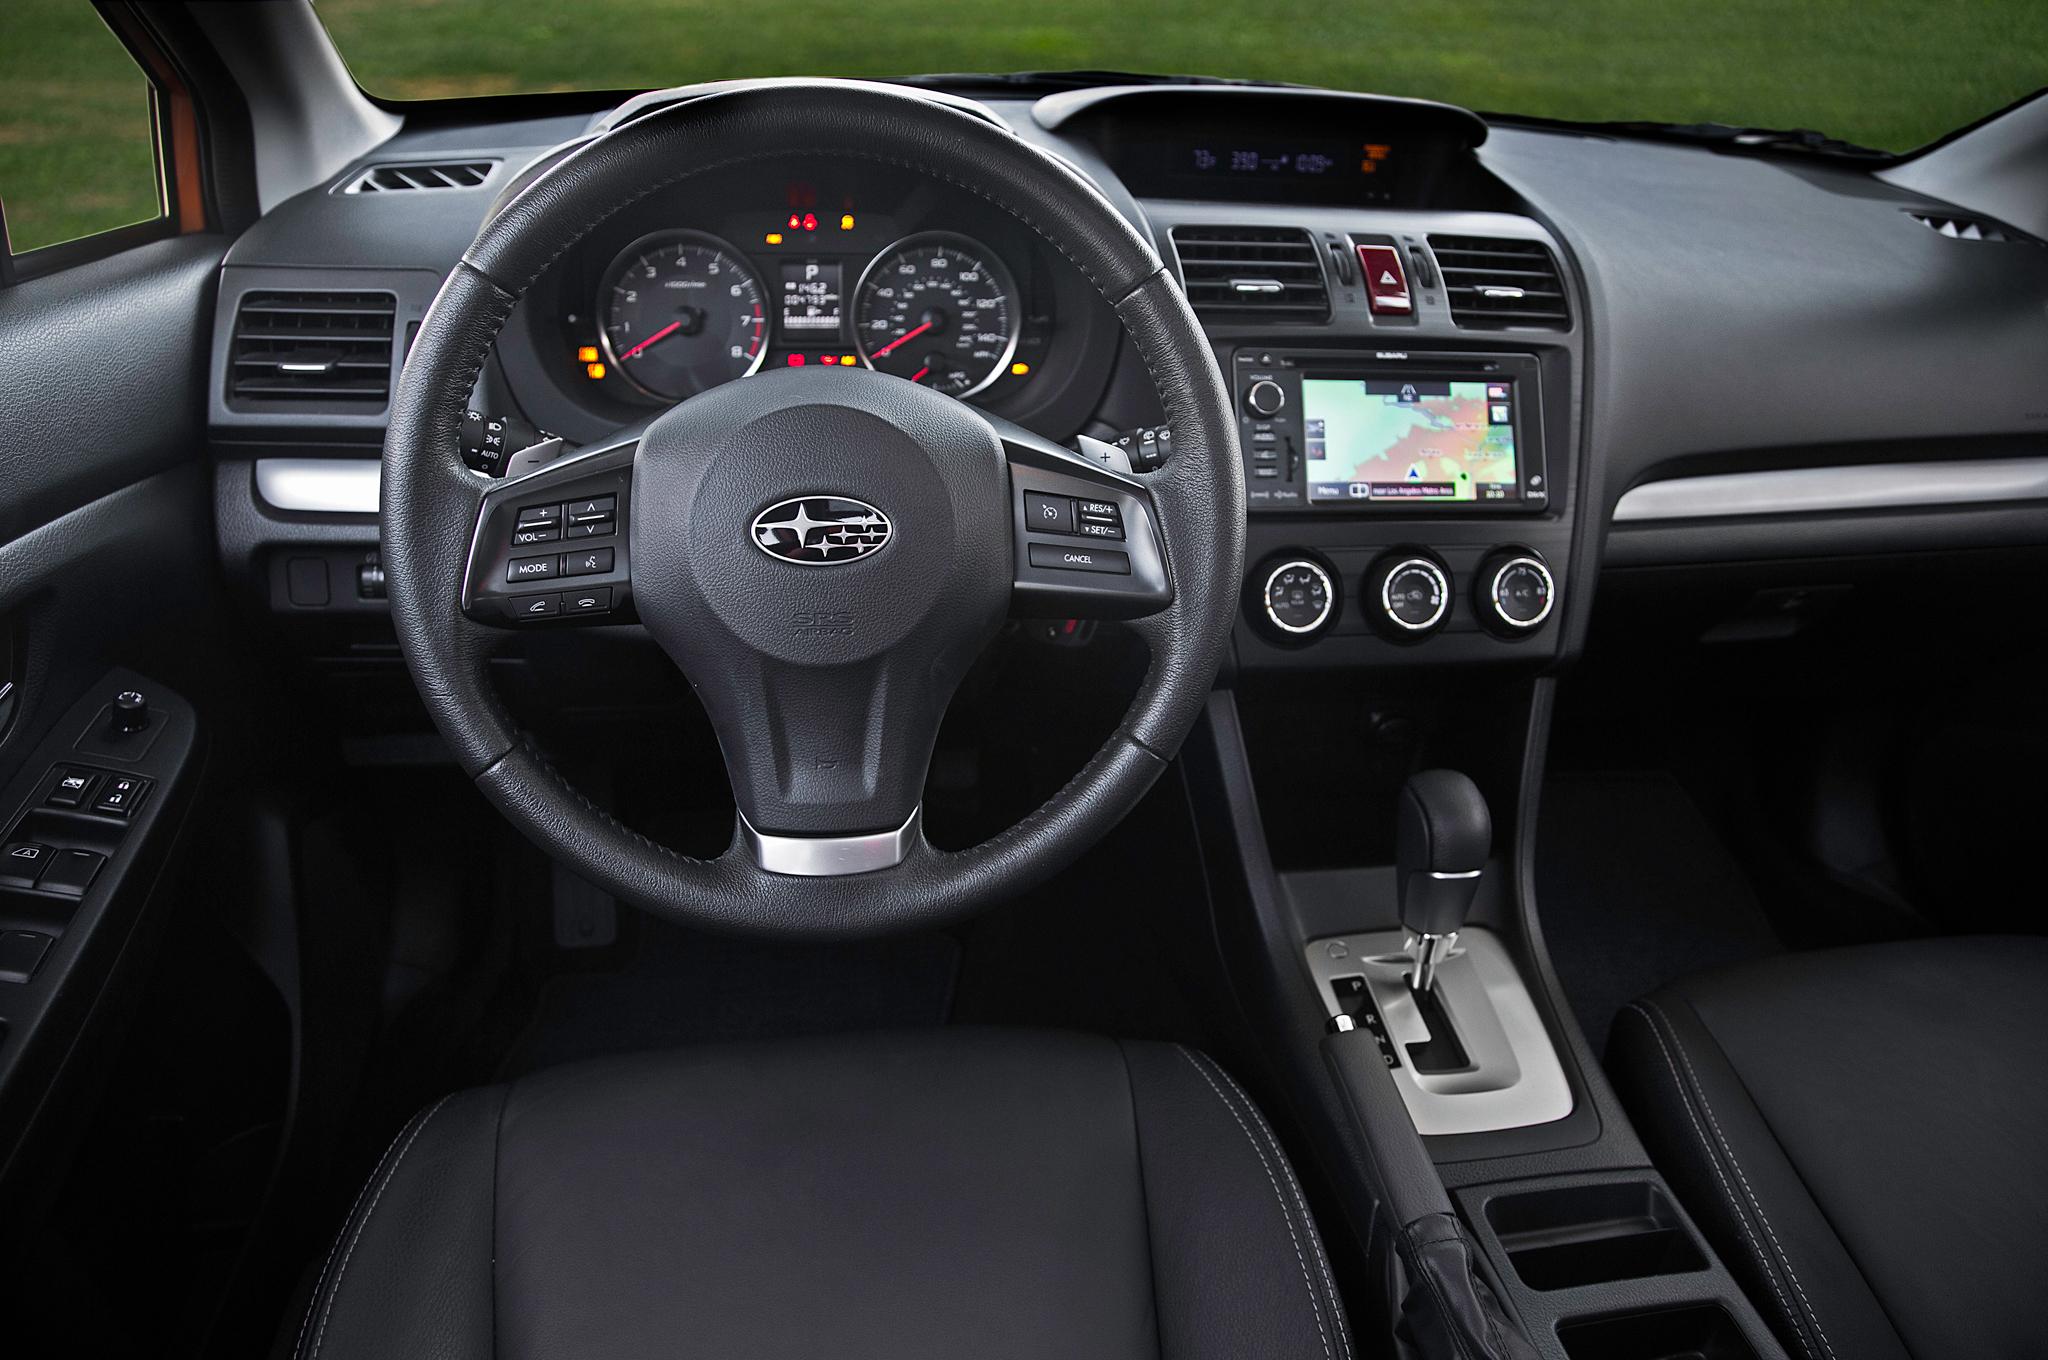 2013 Subaru Xv Crosstrek 2.0 I Limited >> 2013 Subaru Xv Crosstrek 2 0i Limited First Test Photo Image Gallery